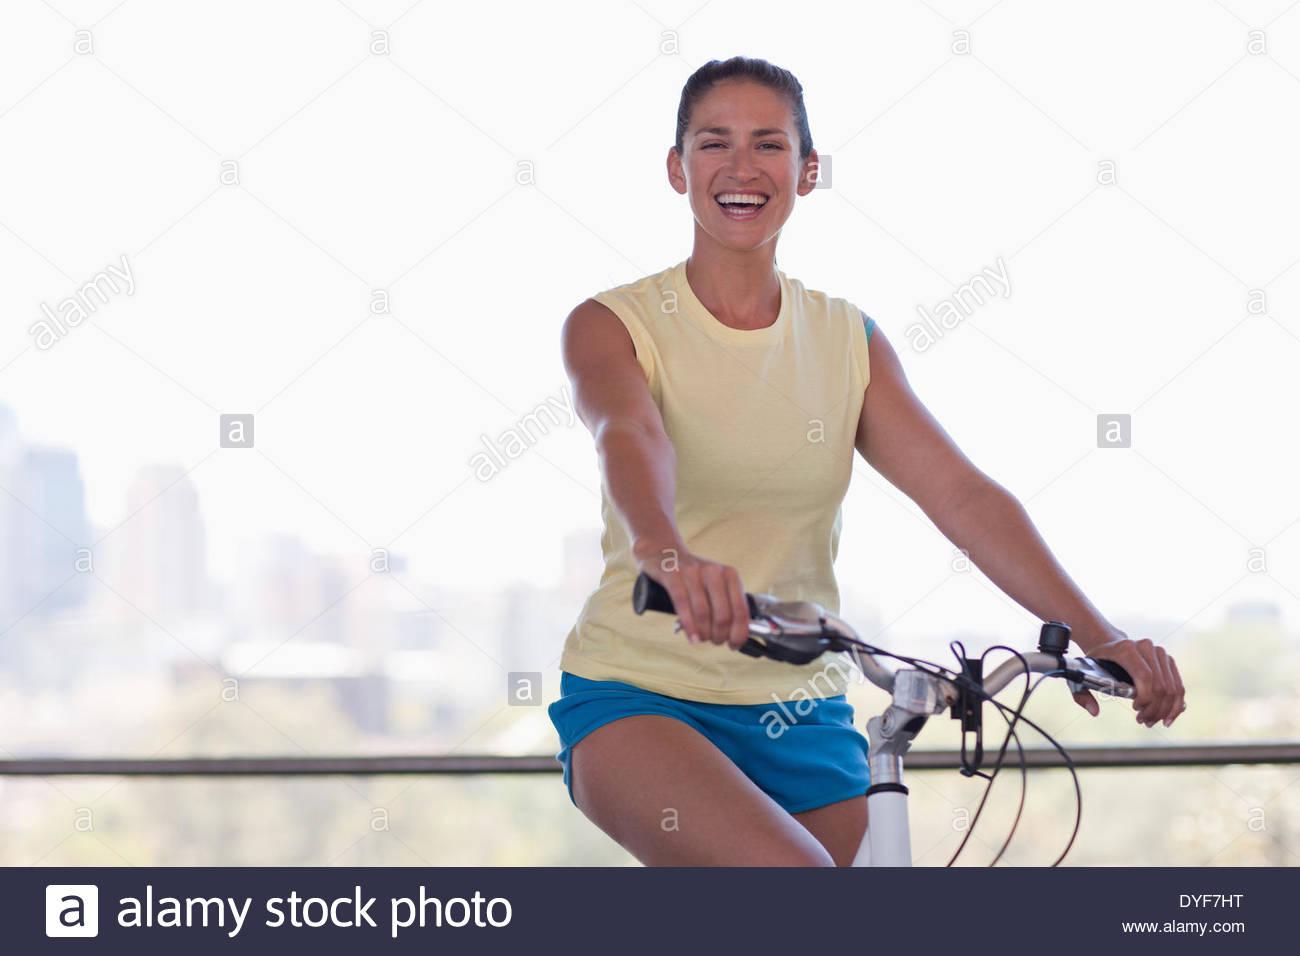 Frau auf dem Fahrrad Stockbild